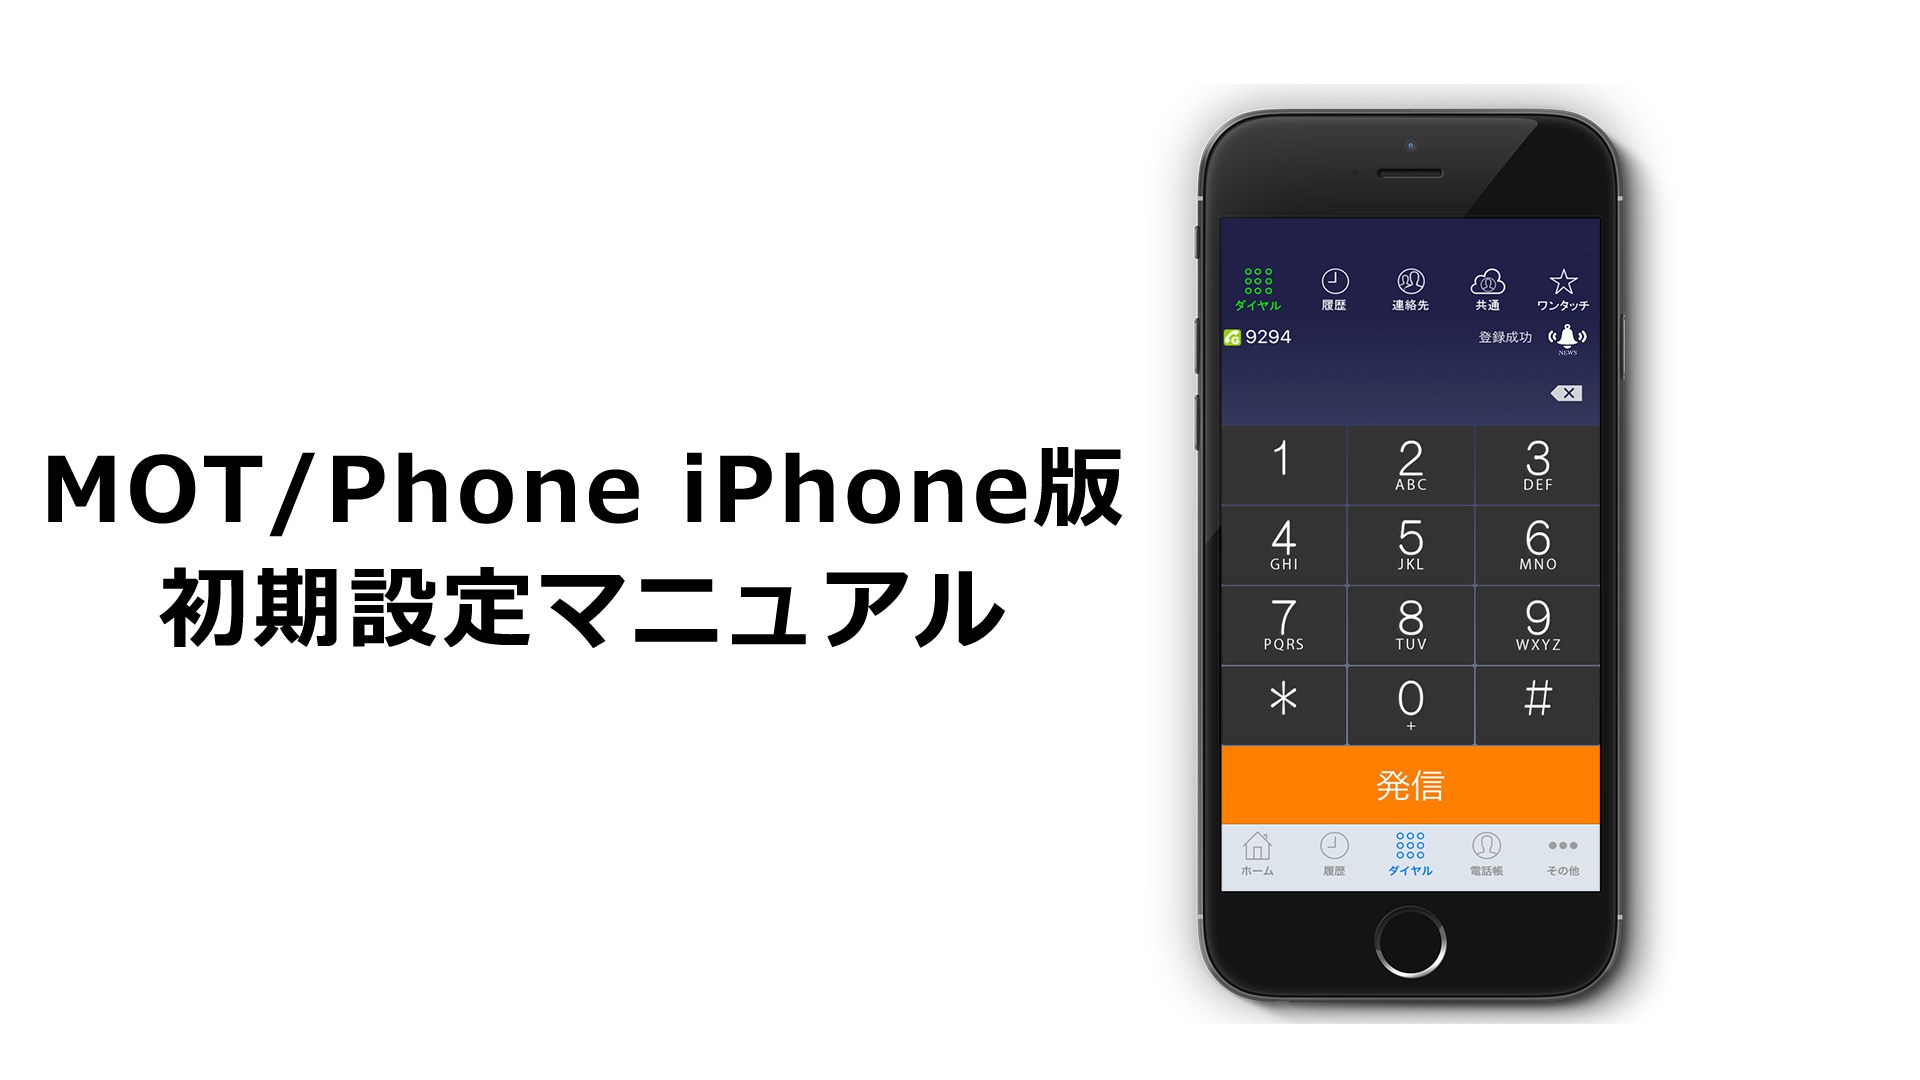 MOTPhone_iPhone版初期設定マニュアル